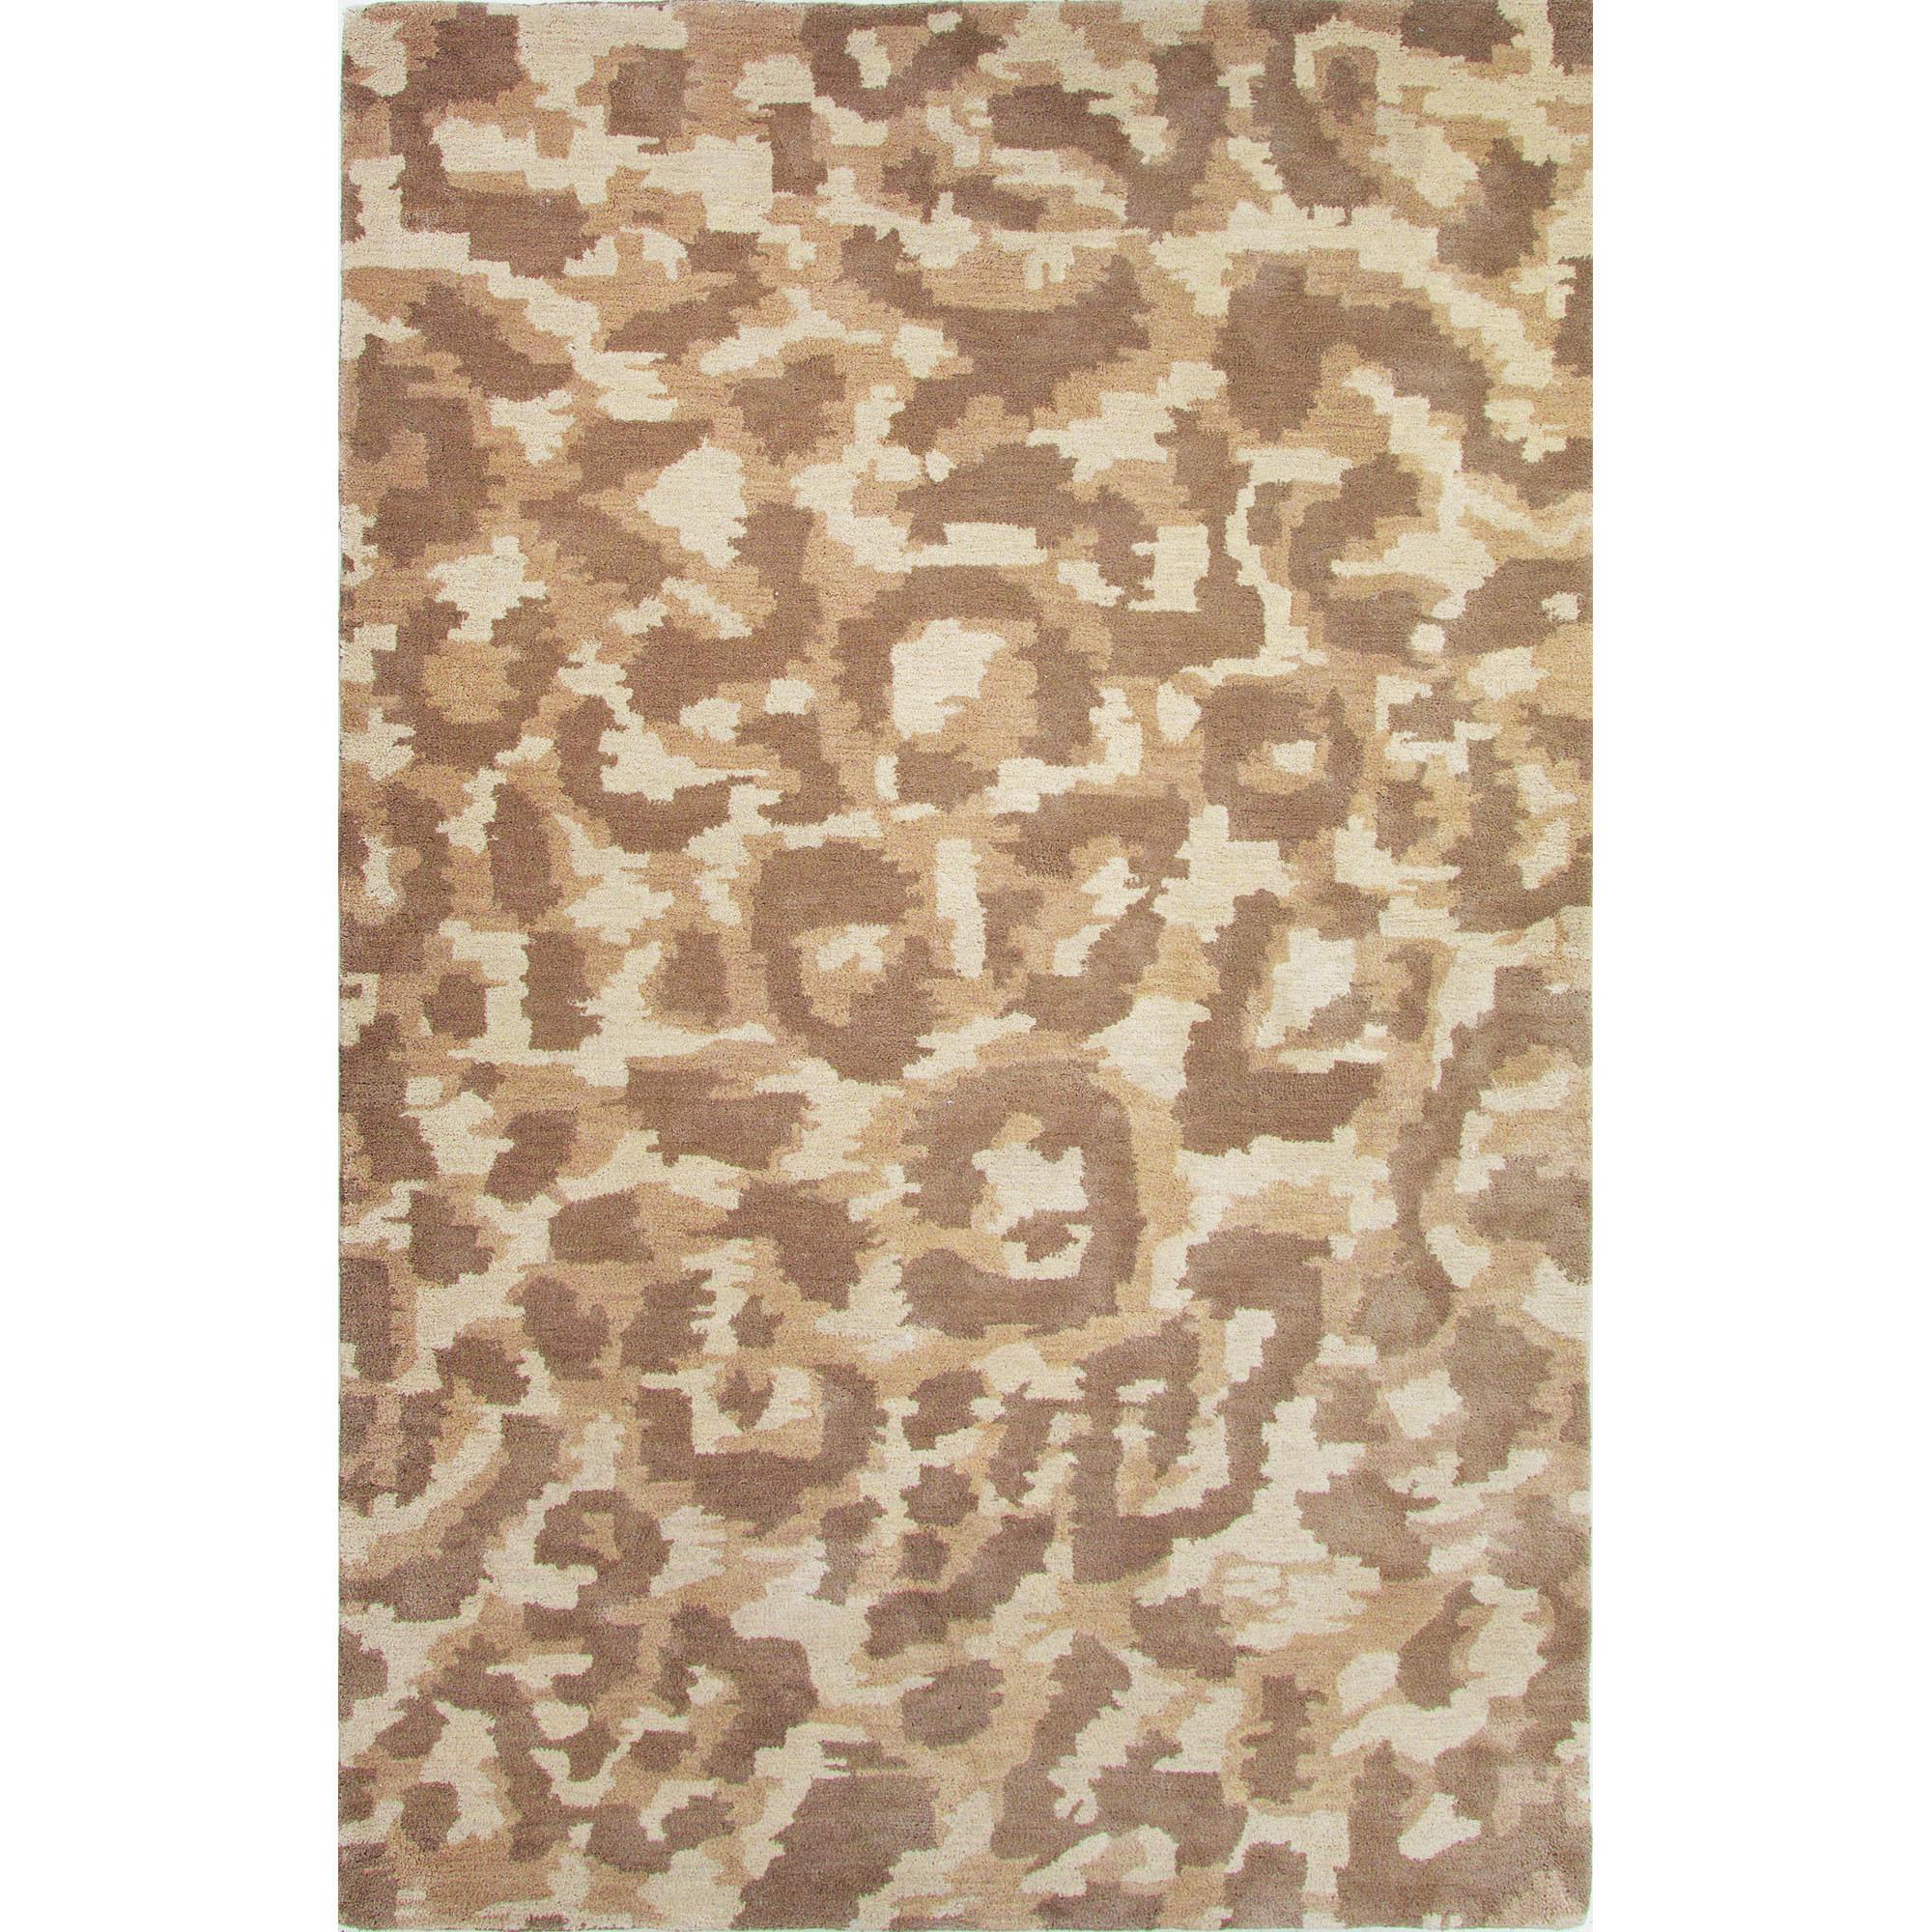 JAIPUR Rugs NatGeo Home Tufted 8 x 10 Rug - Item Number: RUG125000